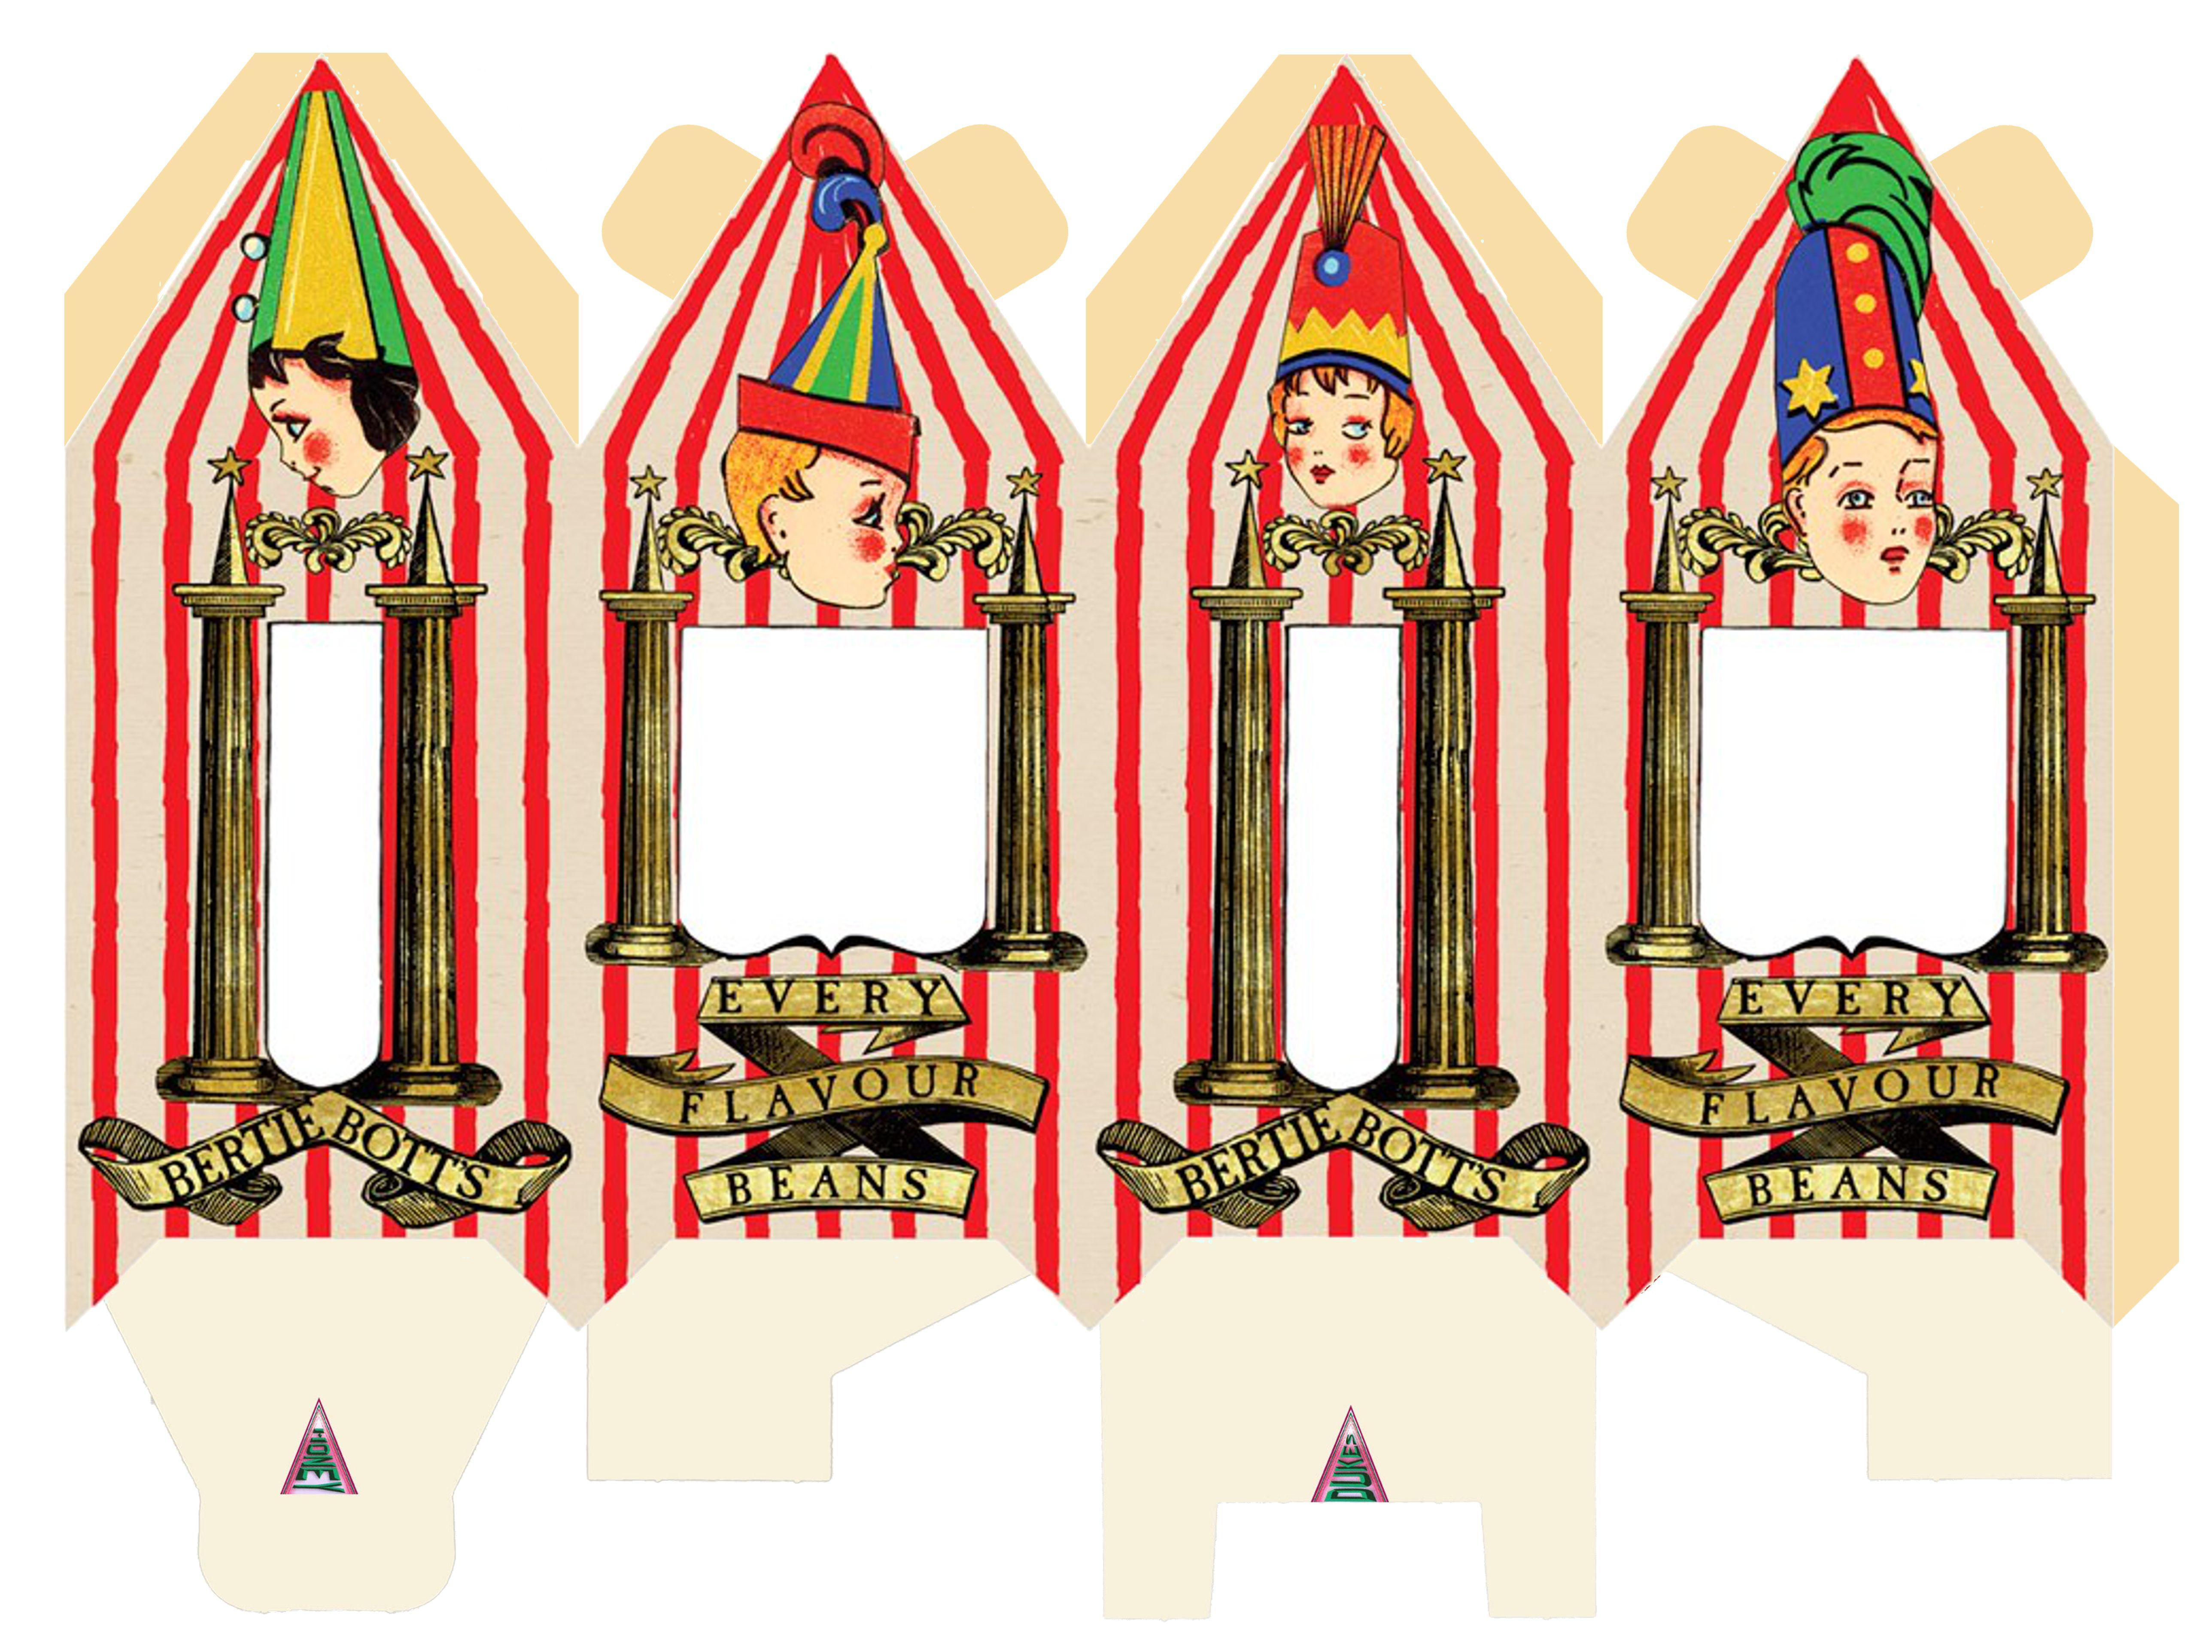 Pin By Sevenpinklemonades On Harry Potter Art Pinterest Harry